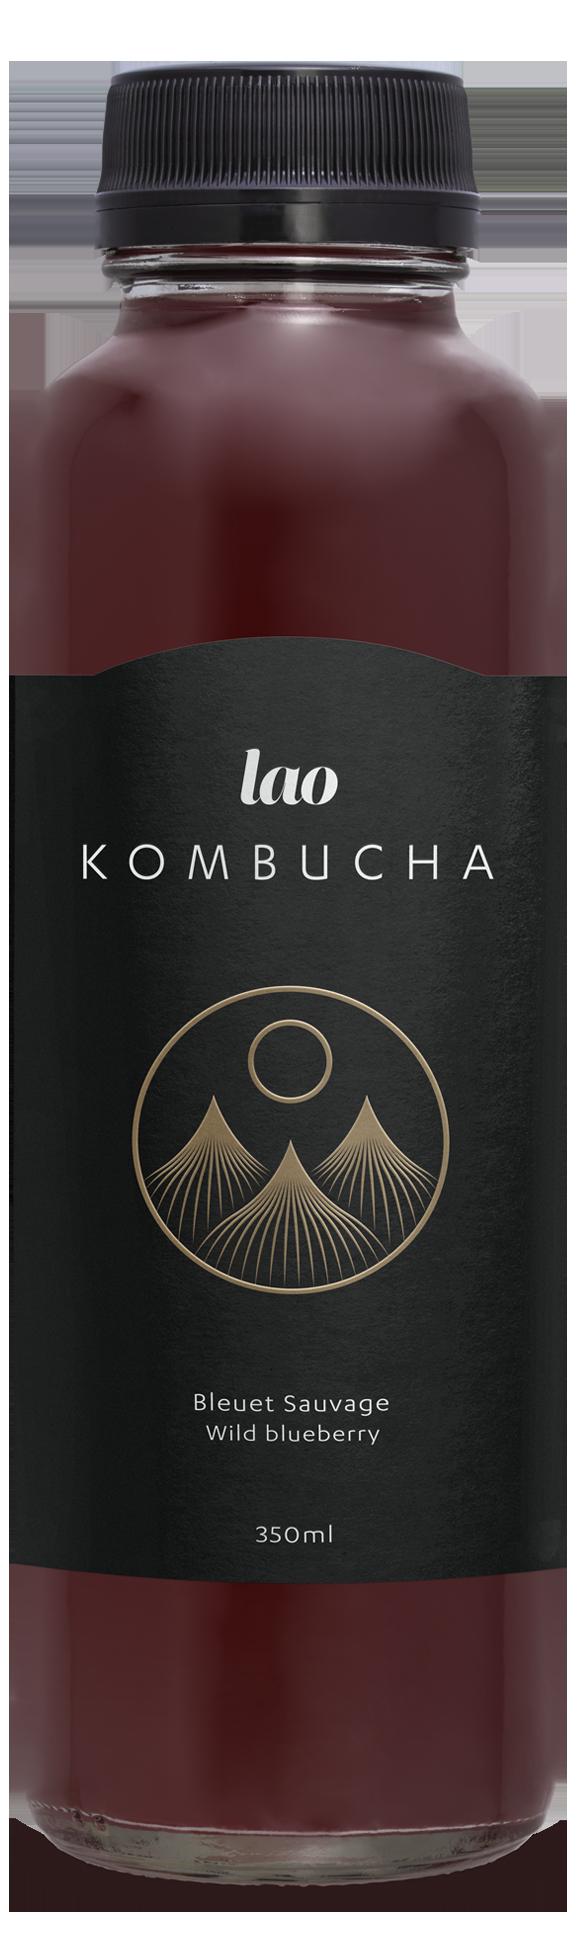 Kombucha PuEr Tea, Blueberry, Wintegreen, Premium, sober, no alchohol